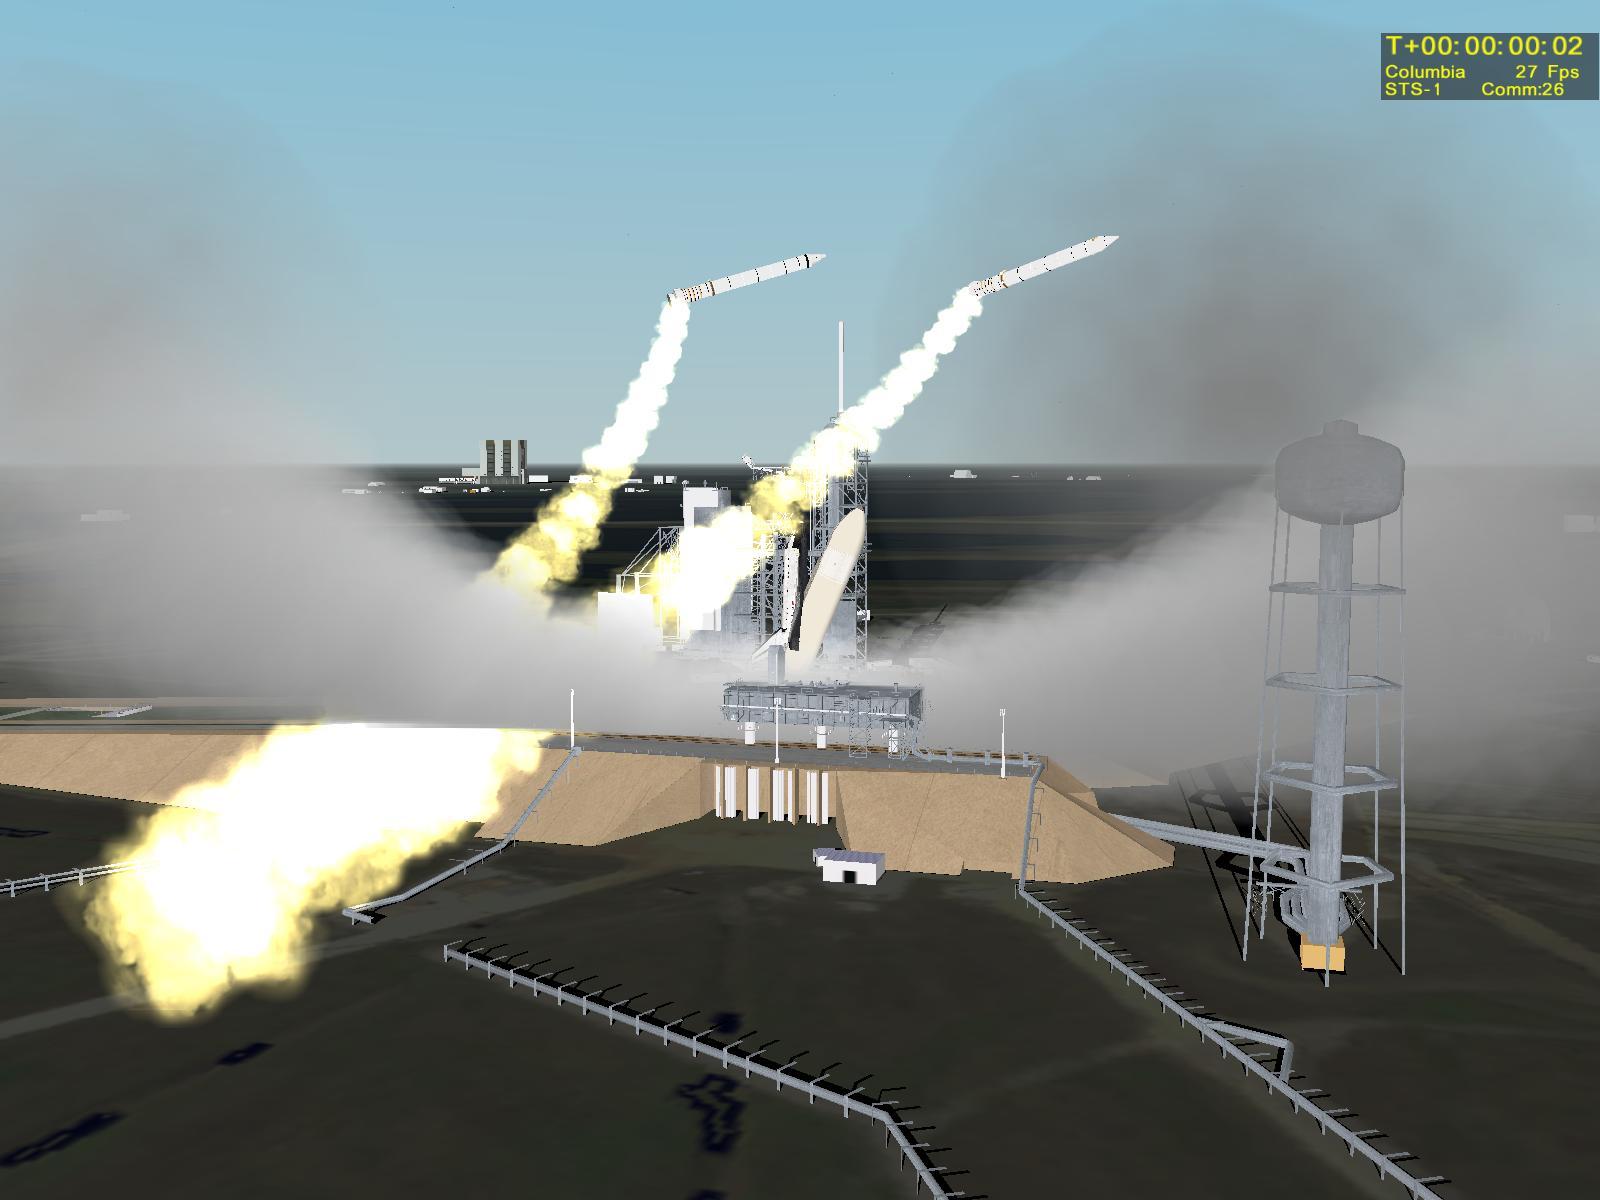 space shuttle srb - photo #27